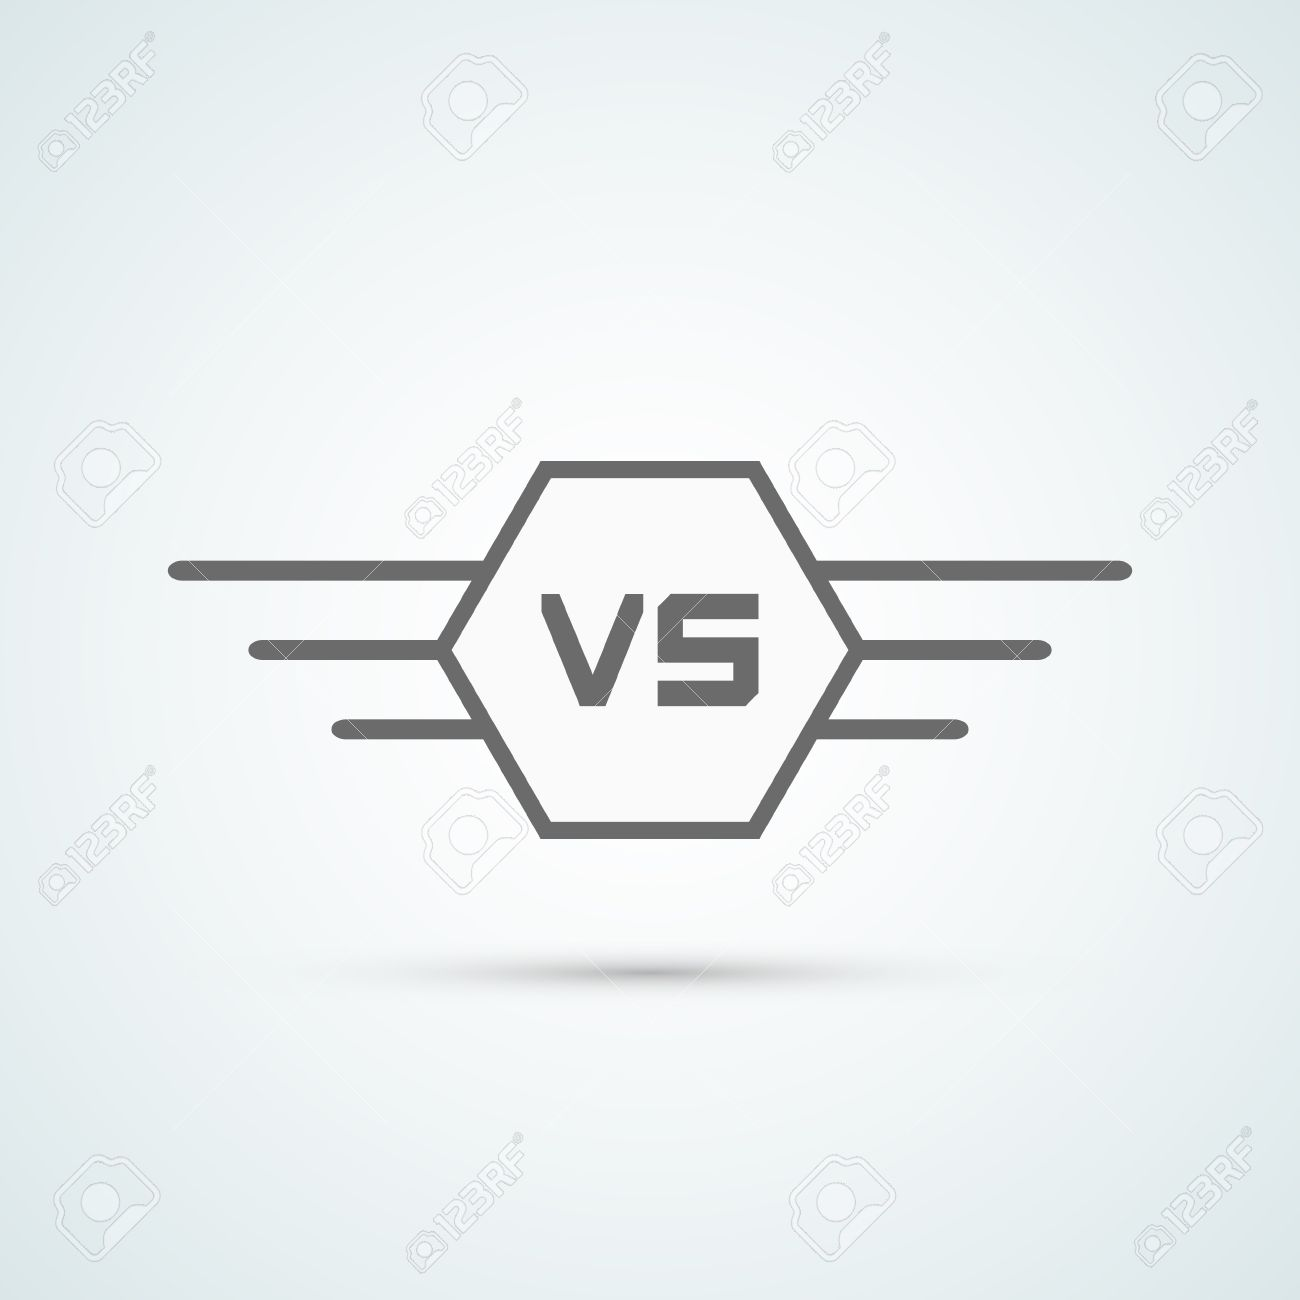 Background image vs background - Versus Logo Vs Vector Letters Illustration Isolated On White Background Stock Vector 49363404